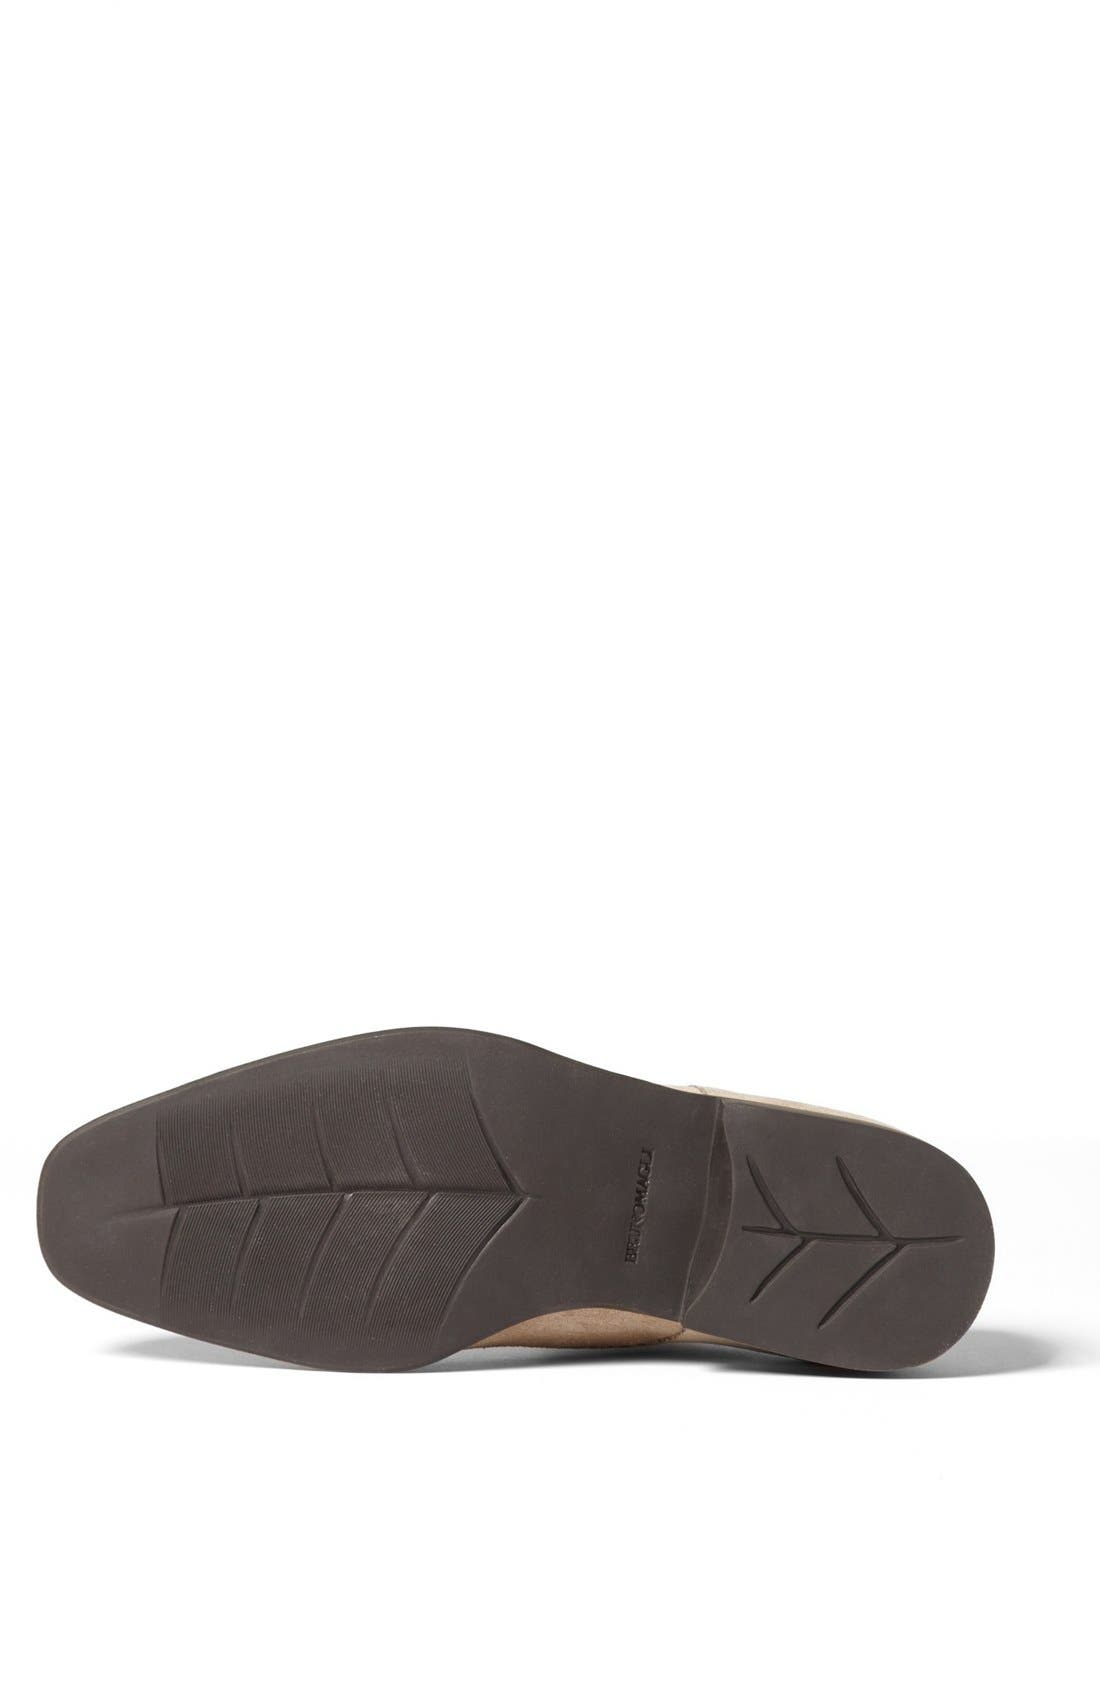 Alternate Image 4  - Bruno Magli 'Raging' Venetian Loafer (Men) (Online Only)